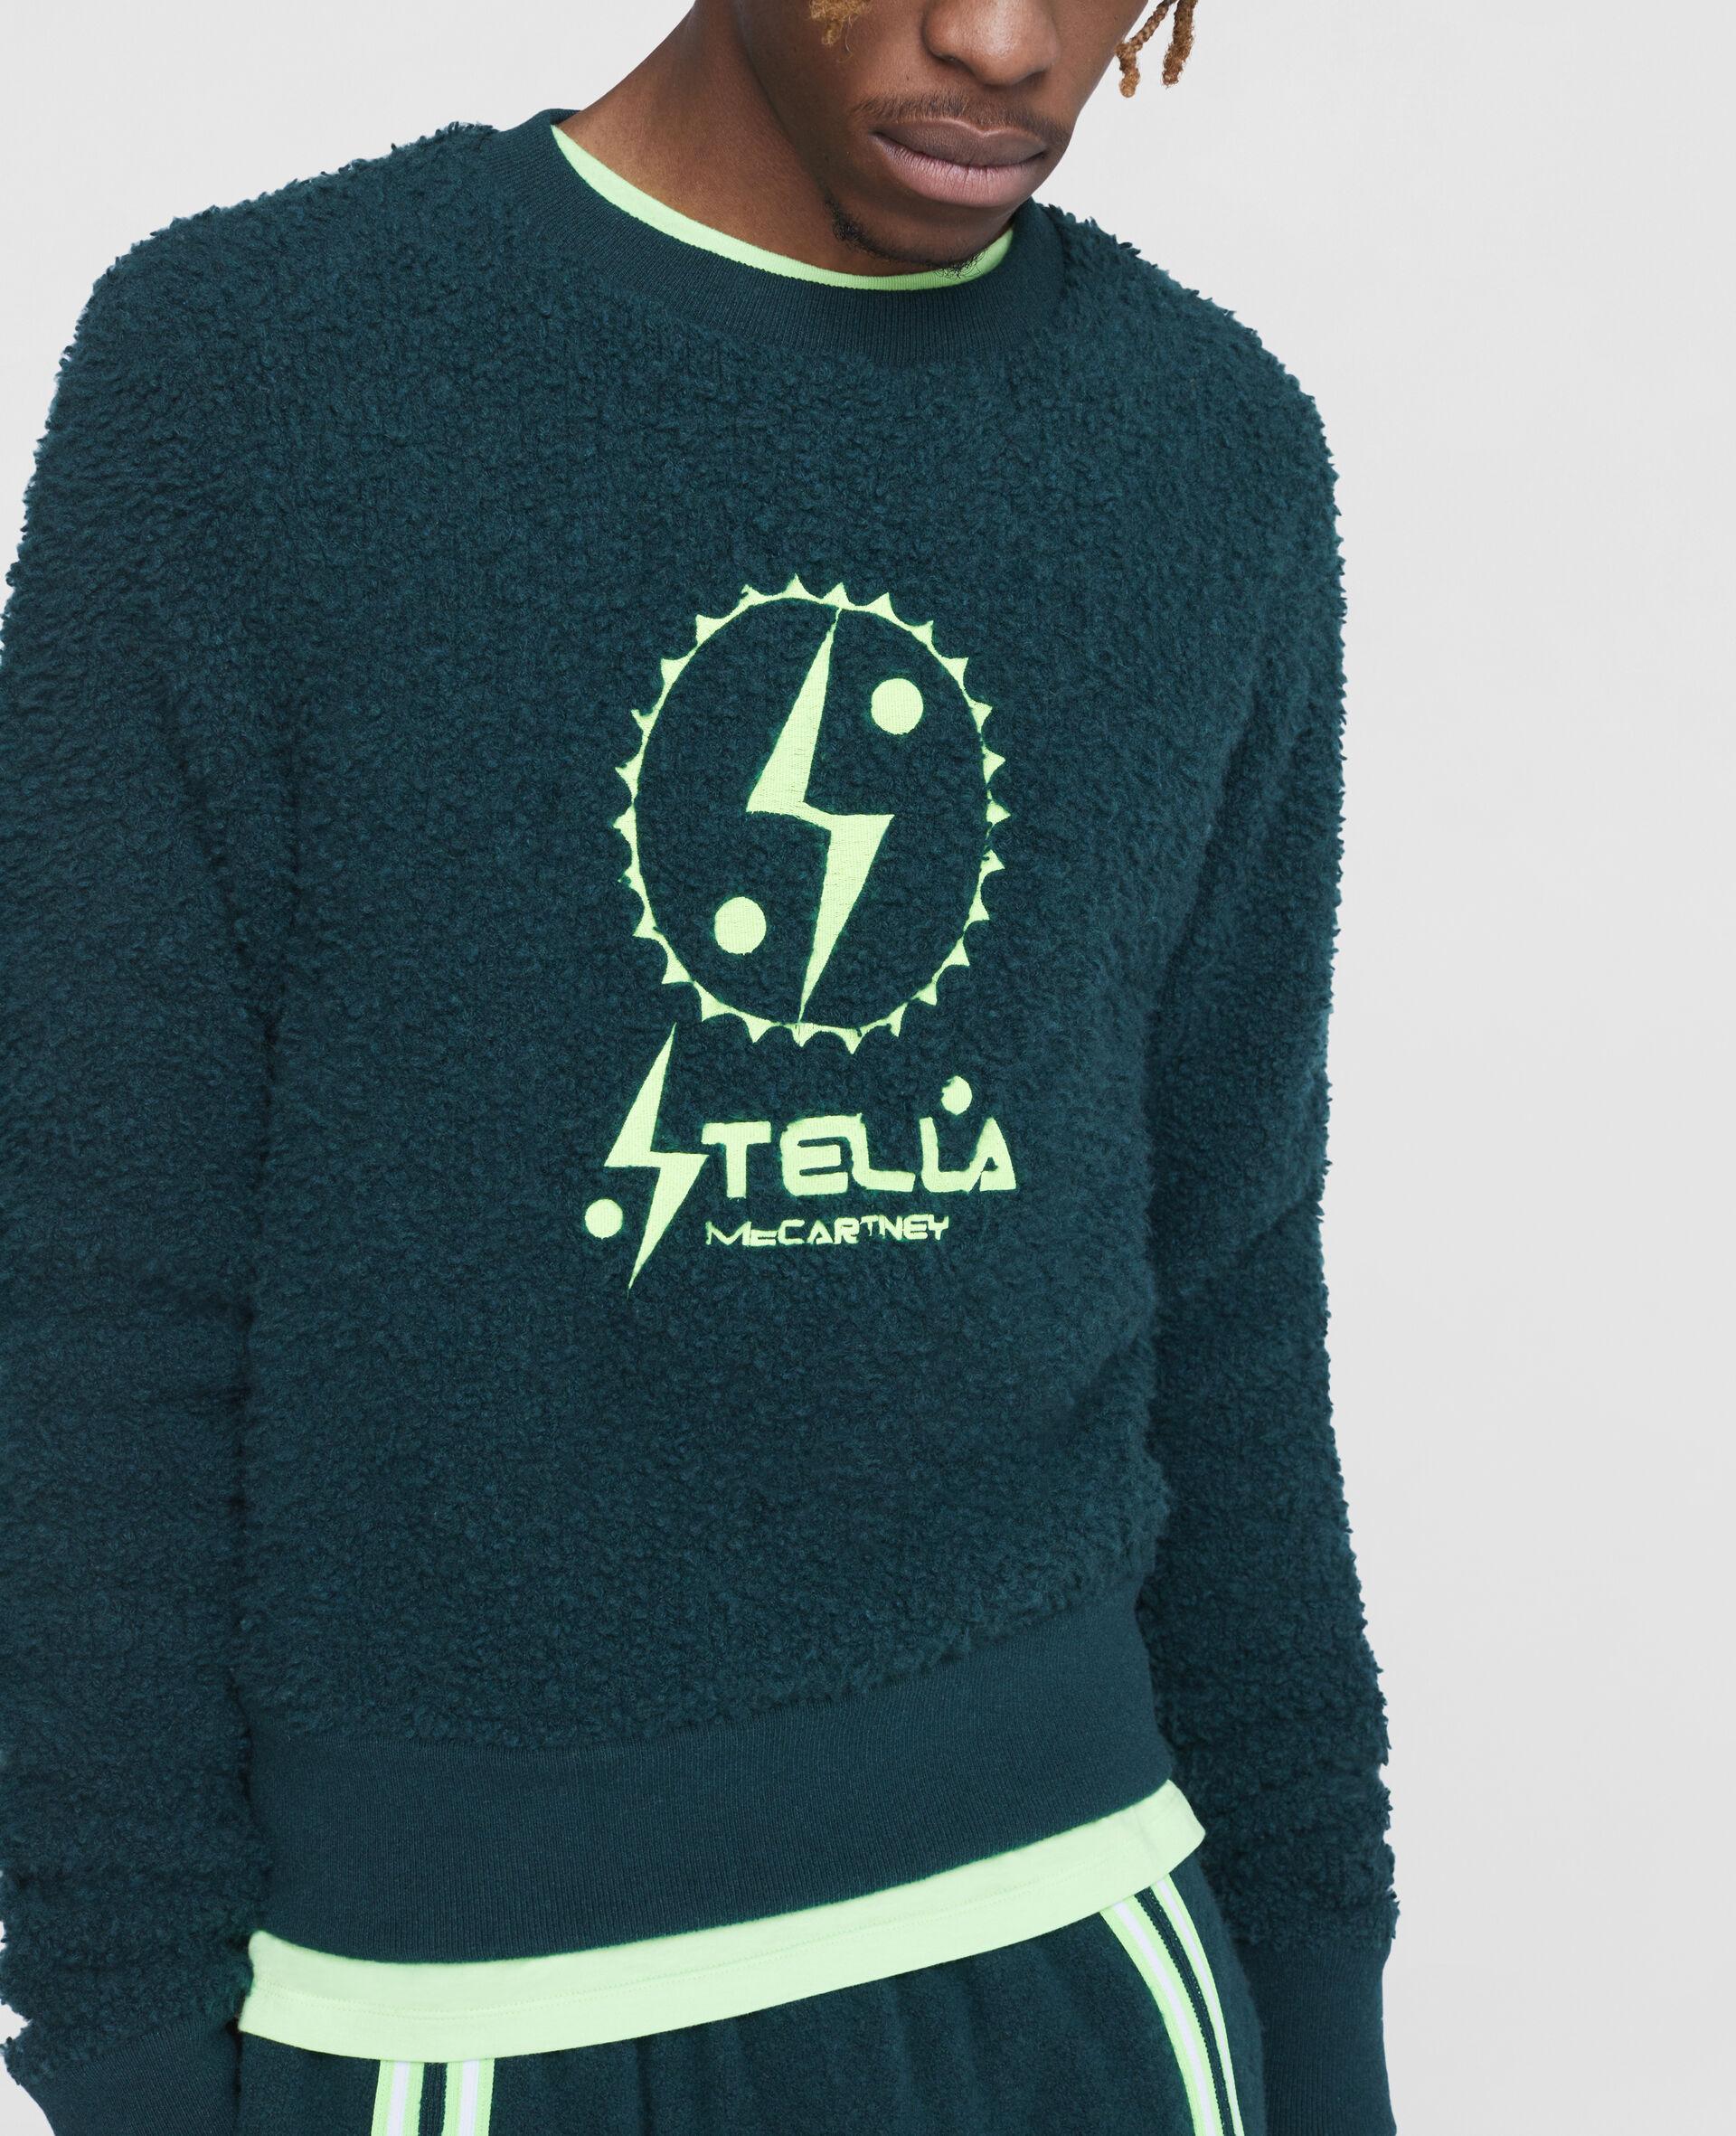 Pull polaire Tom Tosseyn Stella Logo -Vert-large image number 4